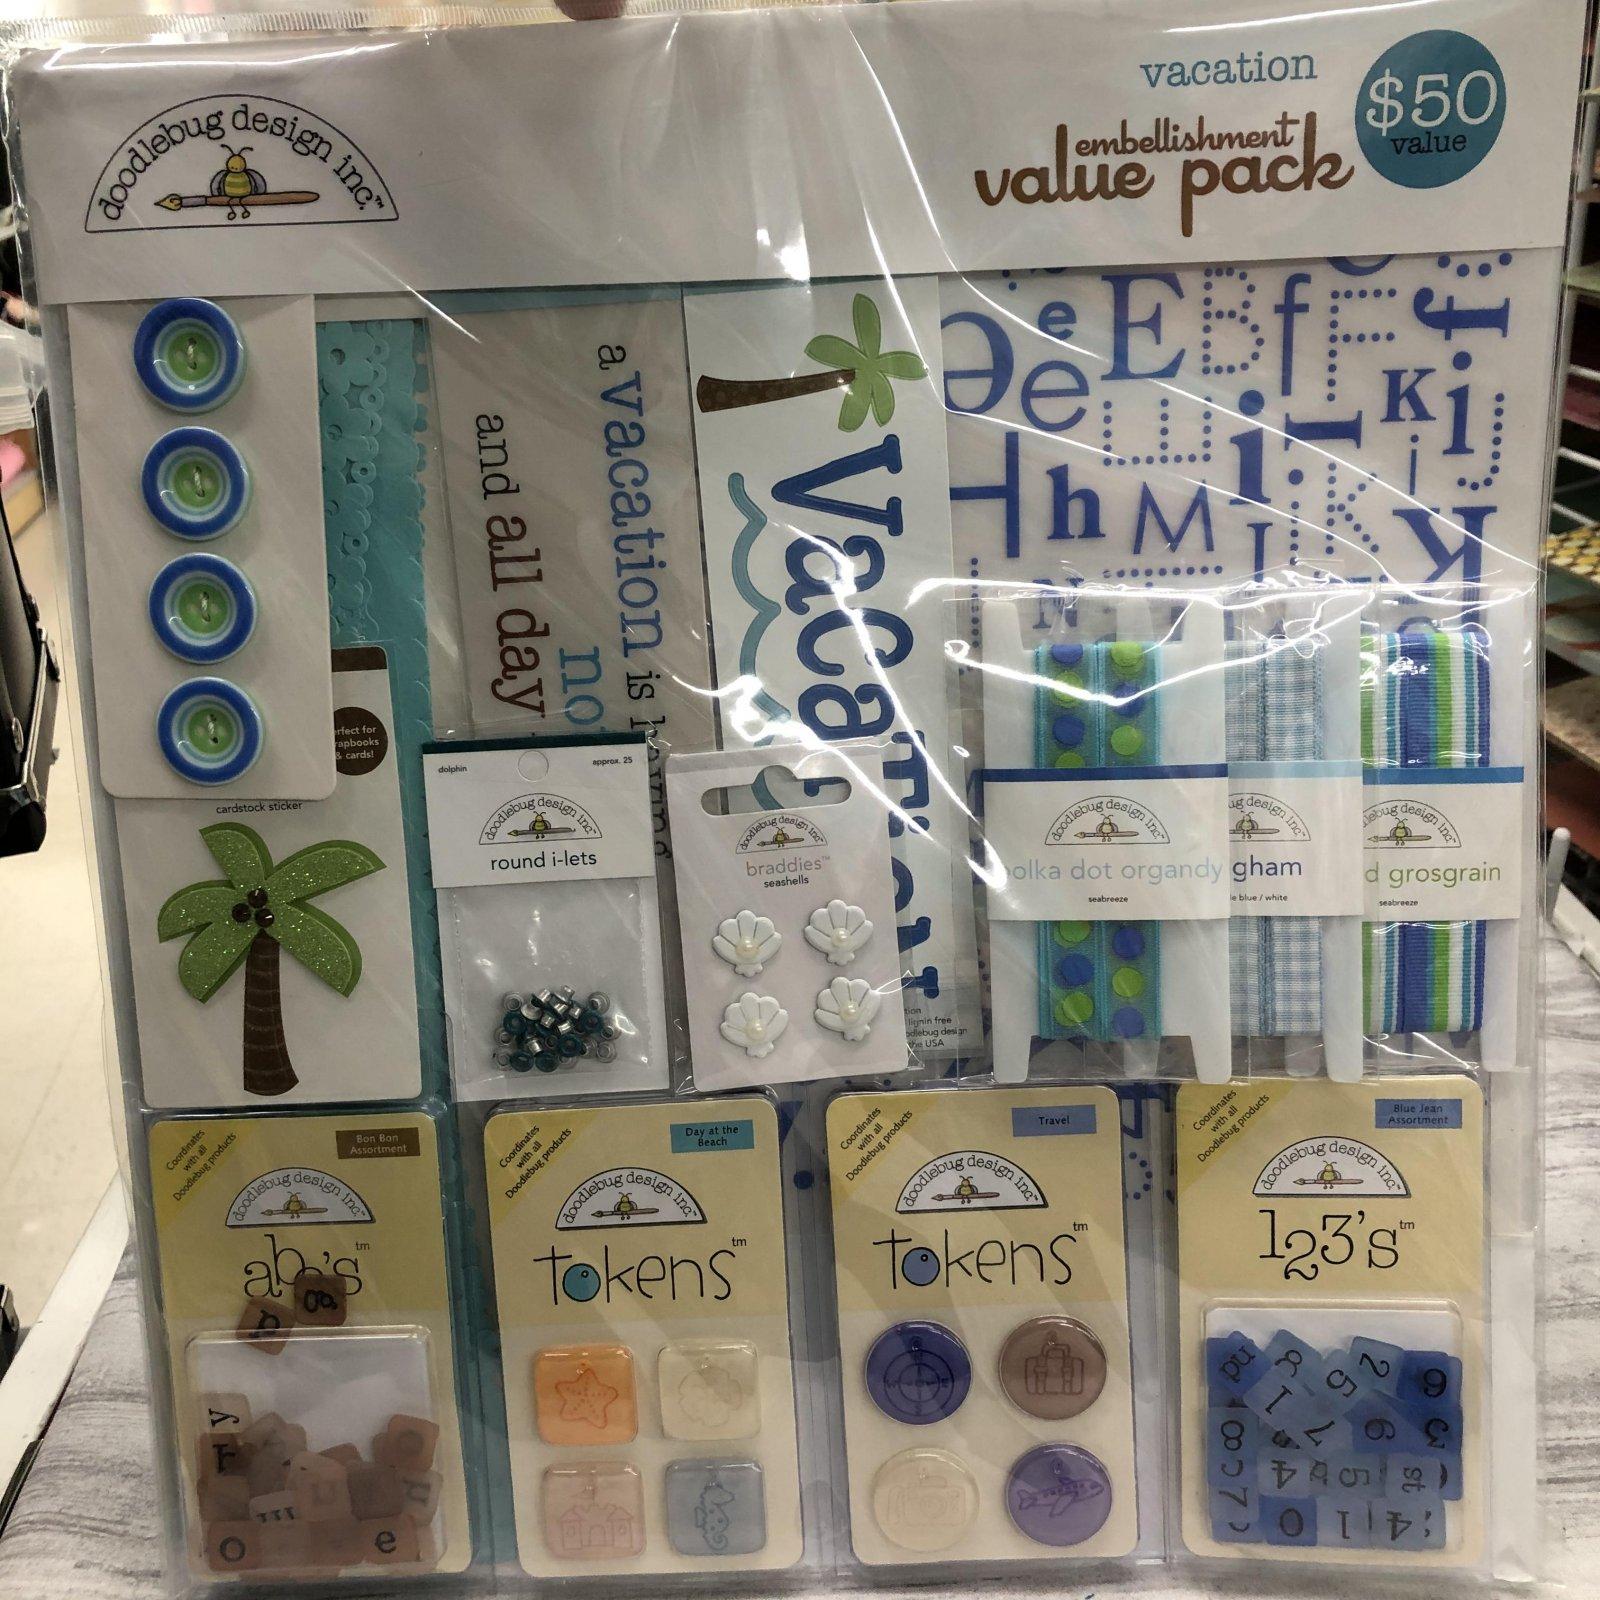 Doodlebug Embellishment Value Pack Vacation 3819